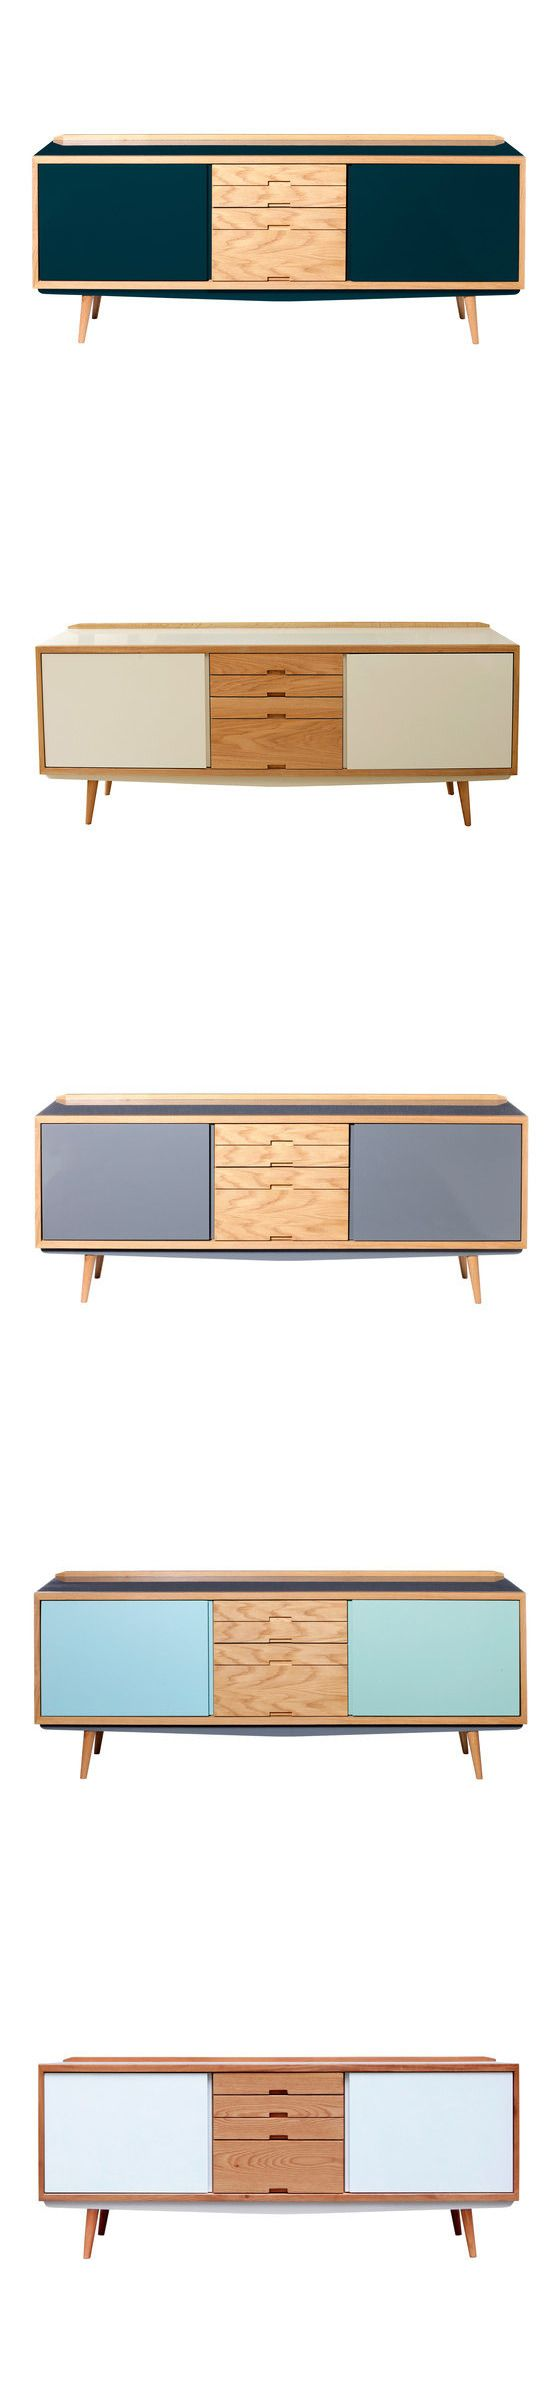 39 best Modern Furniture images on Pinterest | Credenzas ...